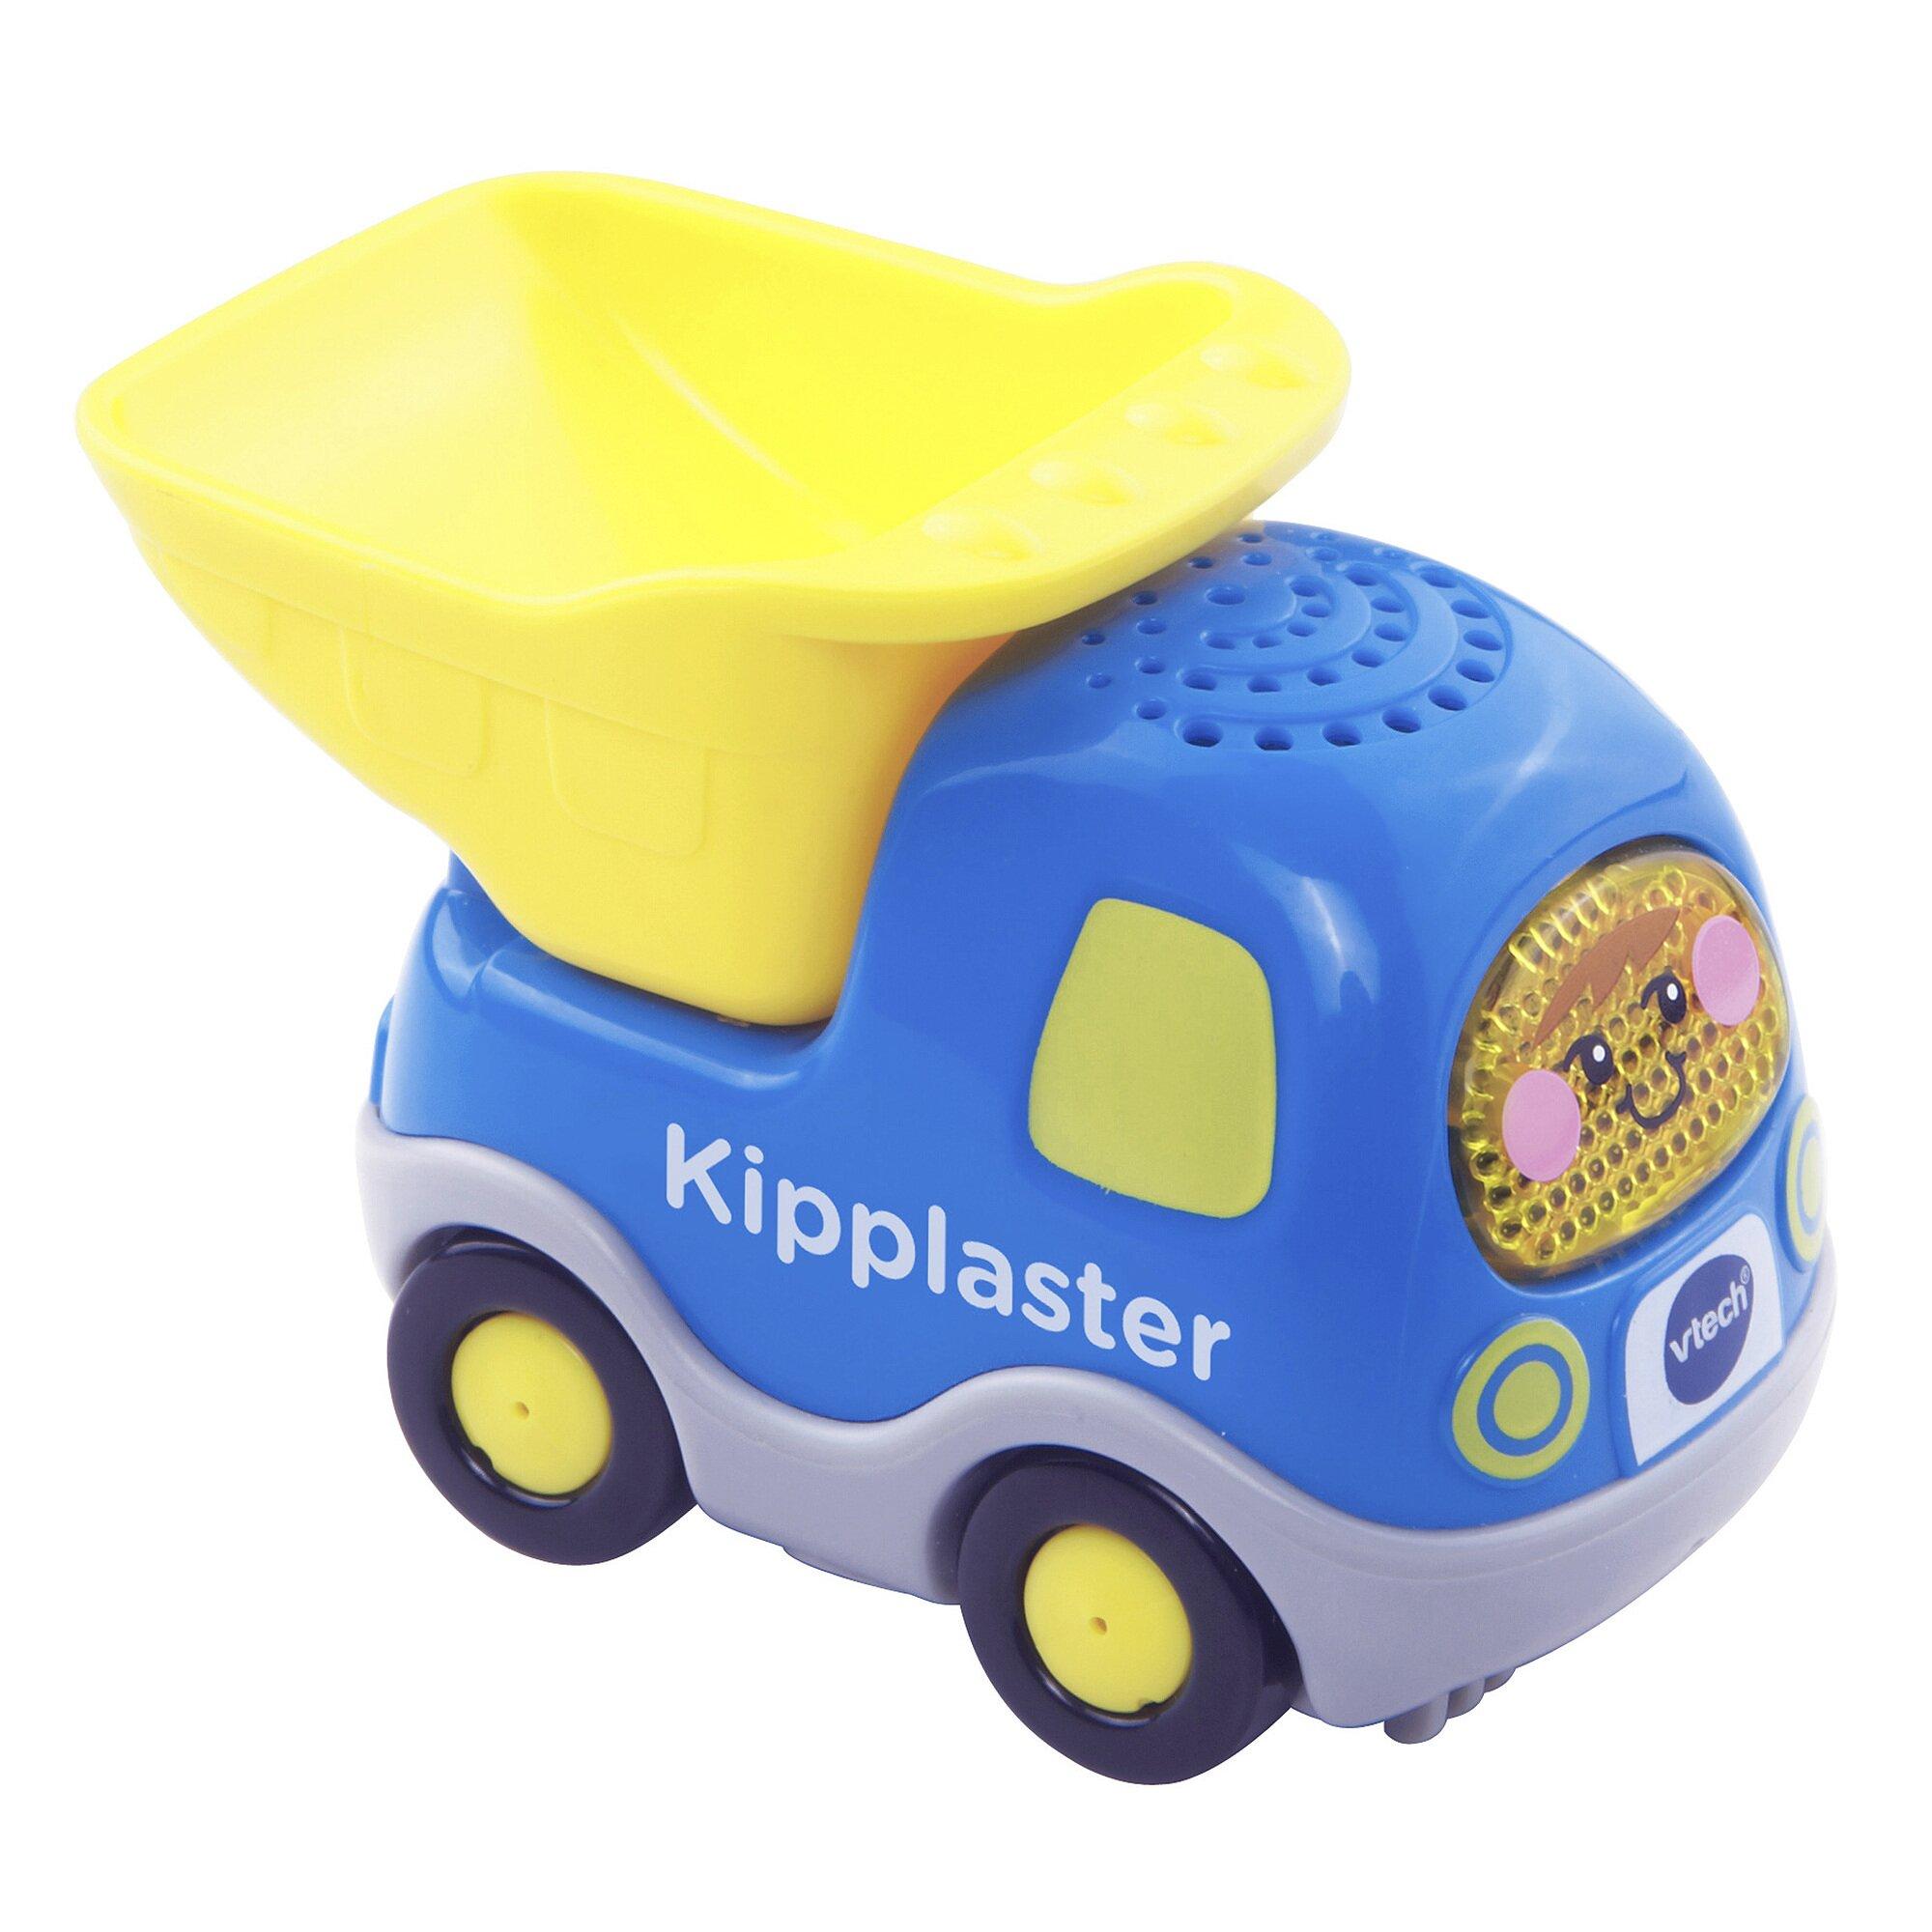 Tut Tut Baby Flitzer Baby Flitzer Kipplaster mit Funktionen